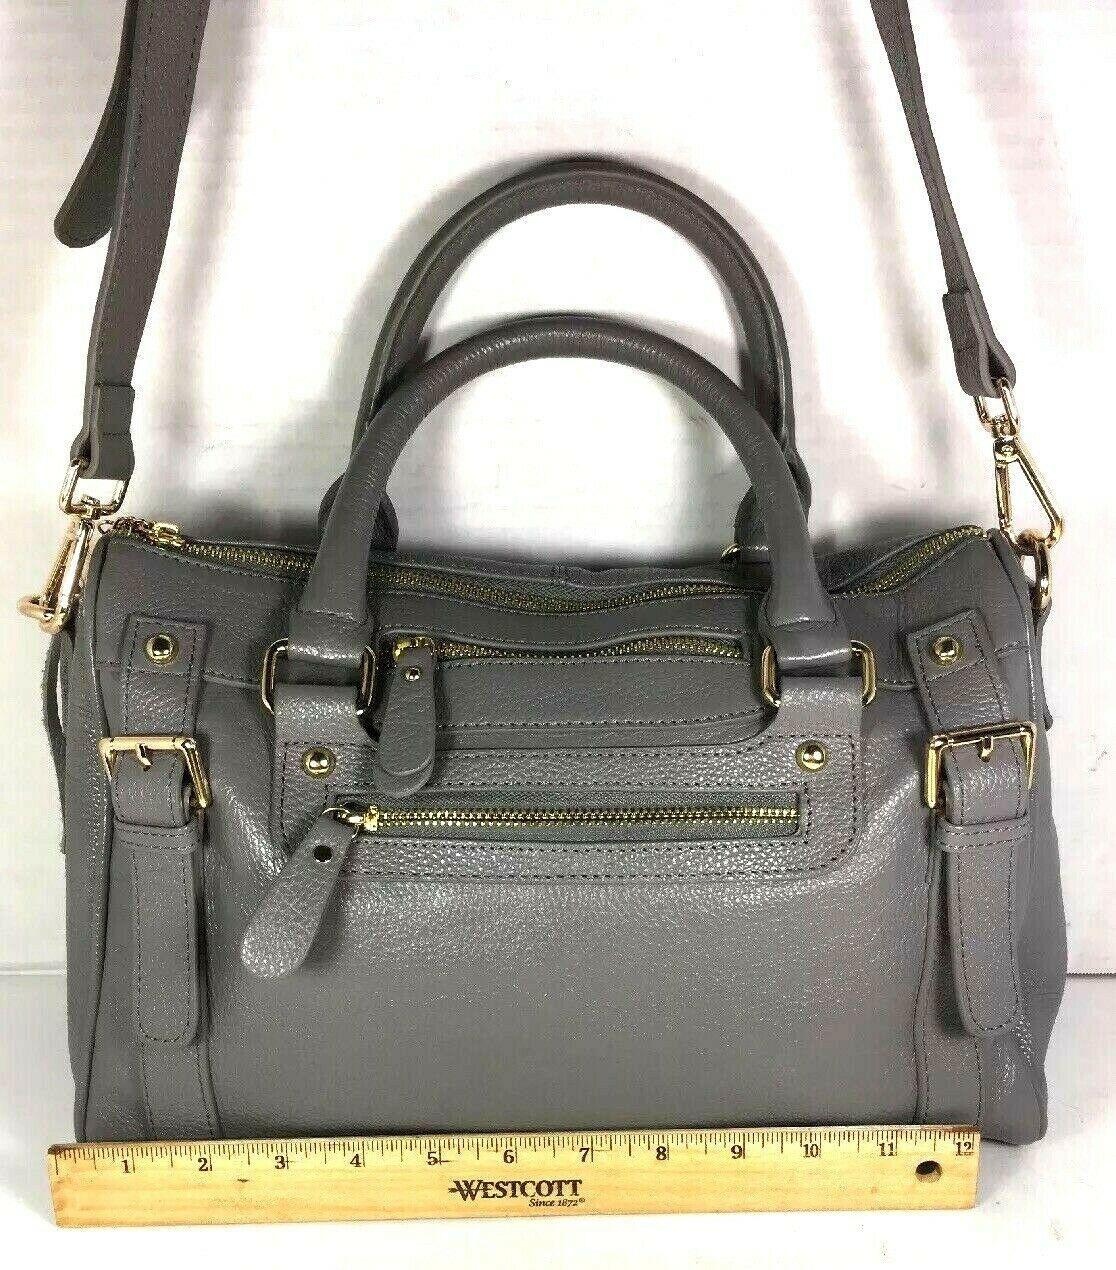 Erica Anenberg Grey Leather Cross Body Satchel Shoulder Bag image 6